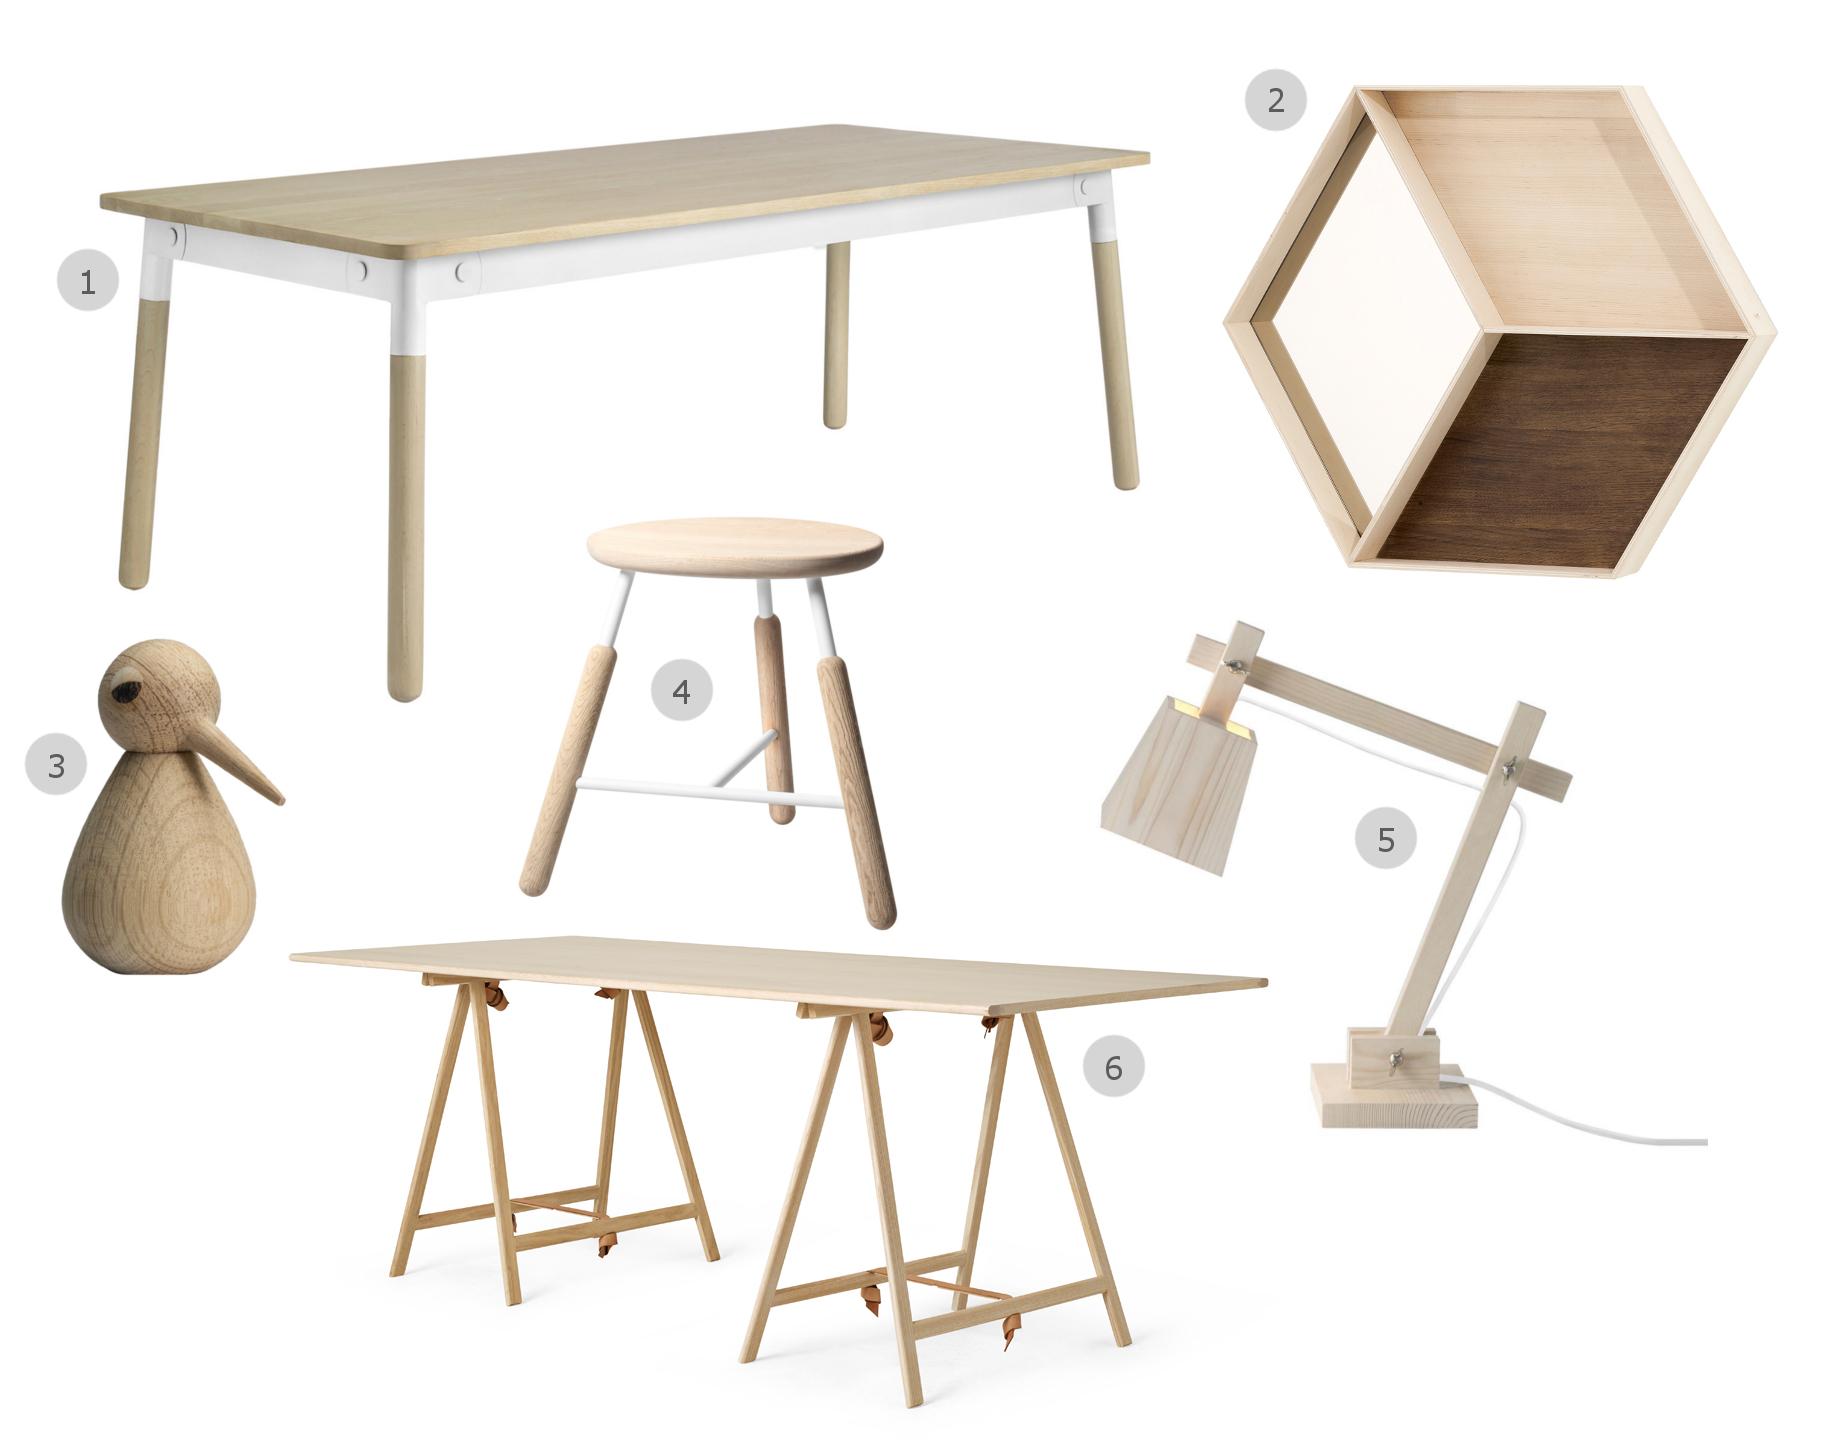 1.Muuto Adaptable Dining Table 2.Ferm Living Wall Wonder Mirror Maple 3.ArchitectMade Large BIRD Figure 4.&Tradition Raft Stool 5.Muuto Wood Table Lamp 6.Menu Knot Trestle Table Natural Ash